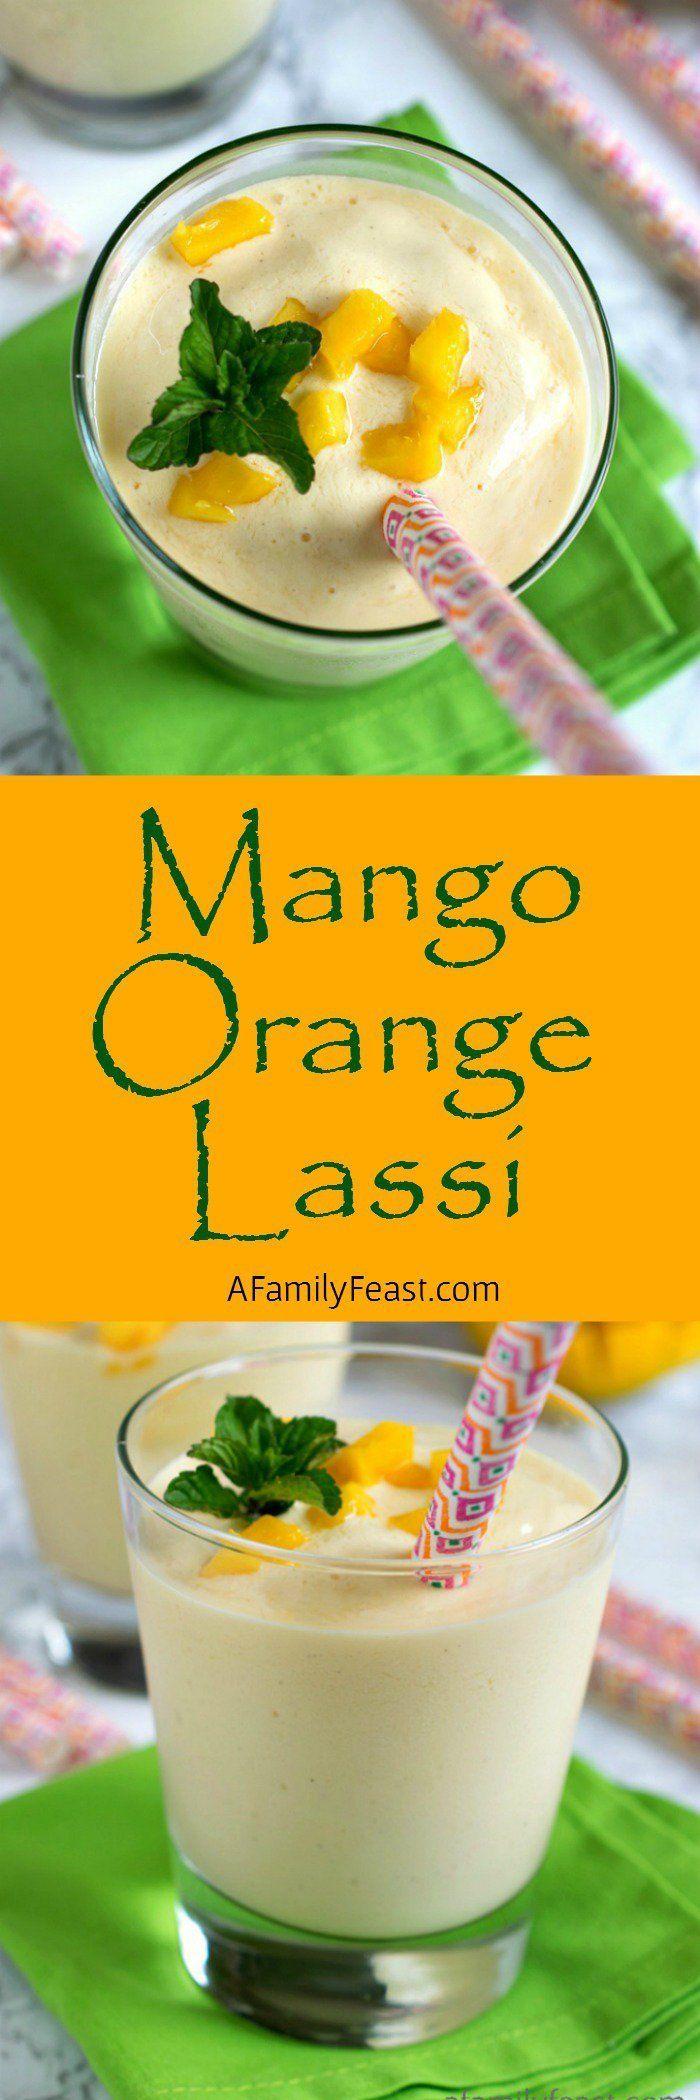 Mango Orange Lassi - A refreshing yogurt drink with sweetness from mango and…